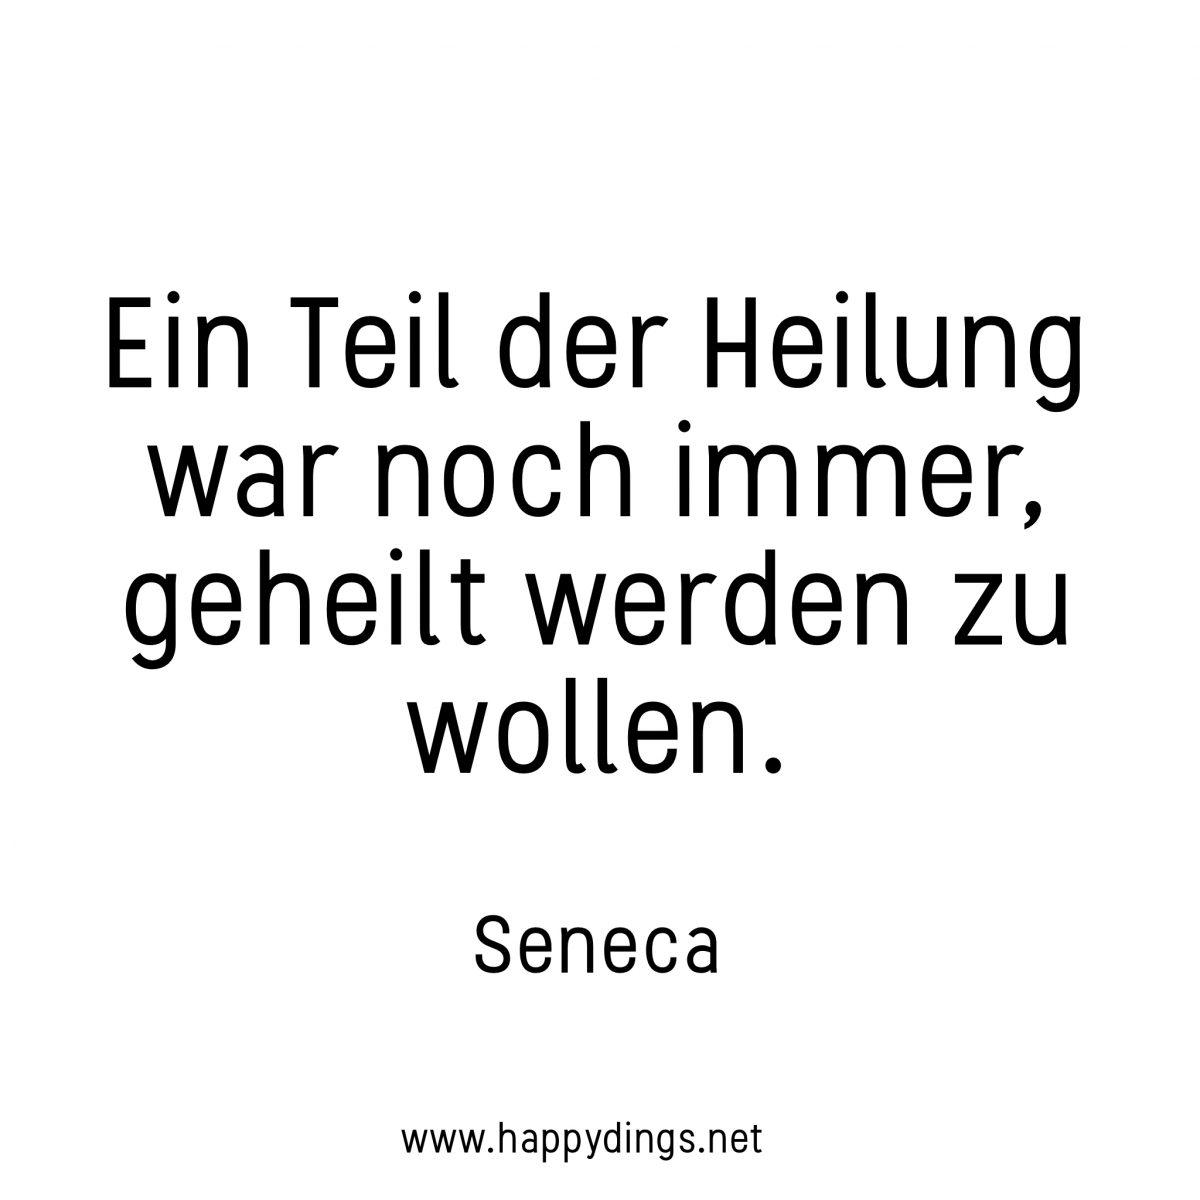 Zitat Seneca Lateinische Zitate Seneca 2019 08 20